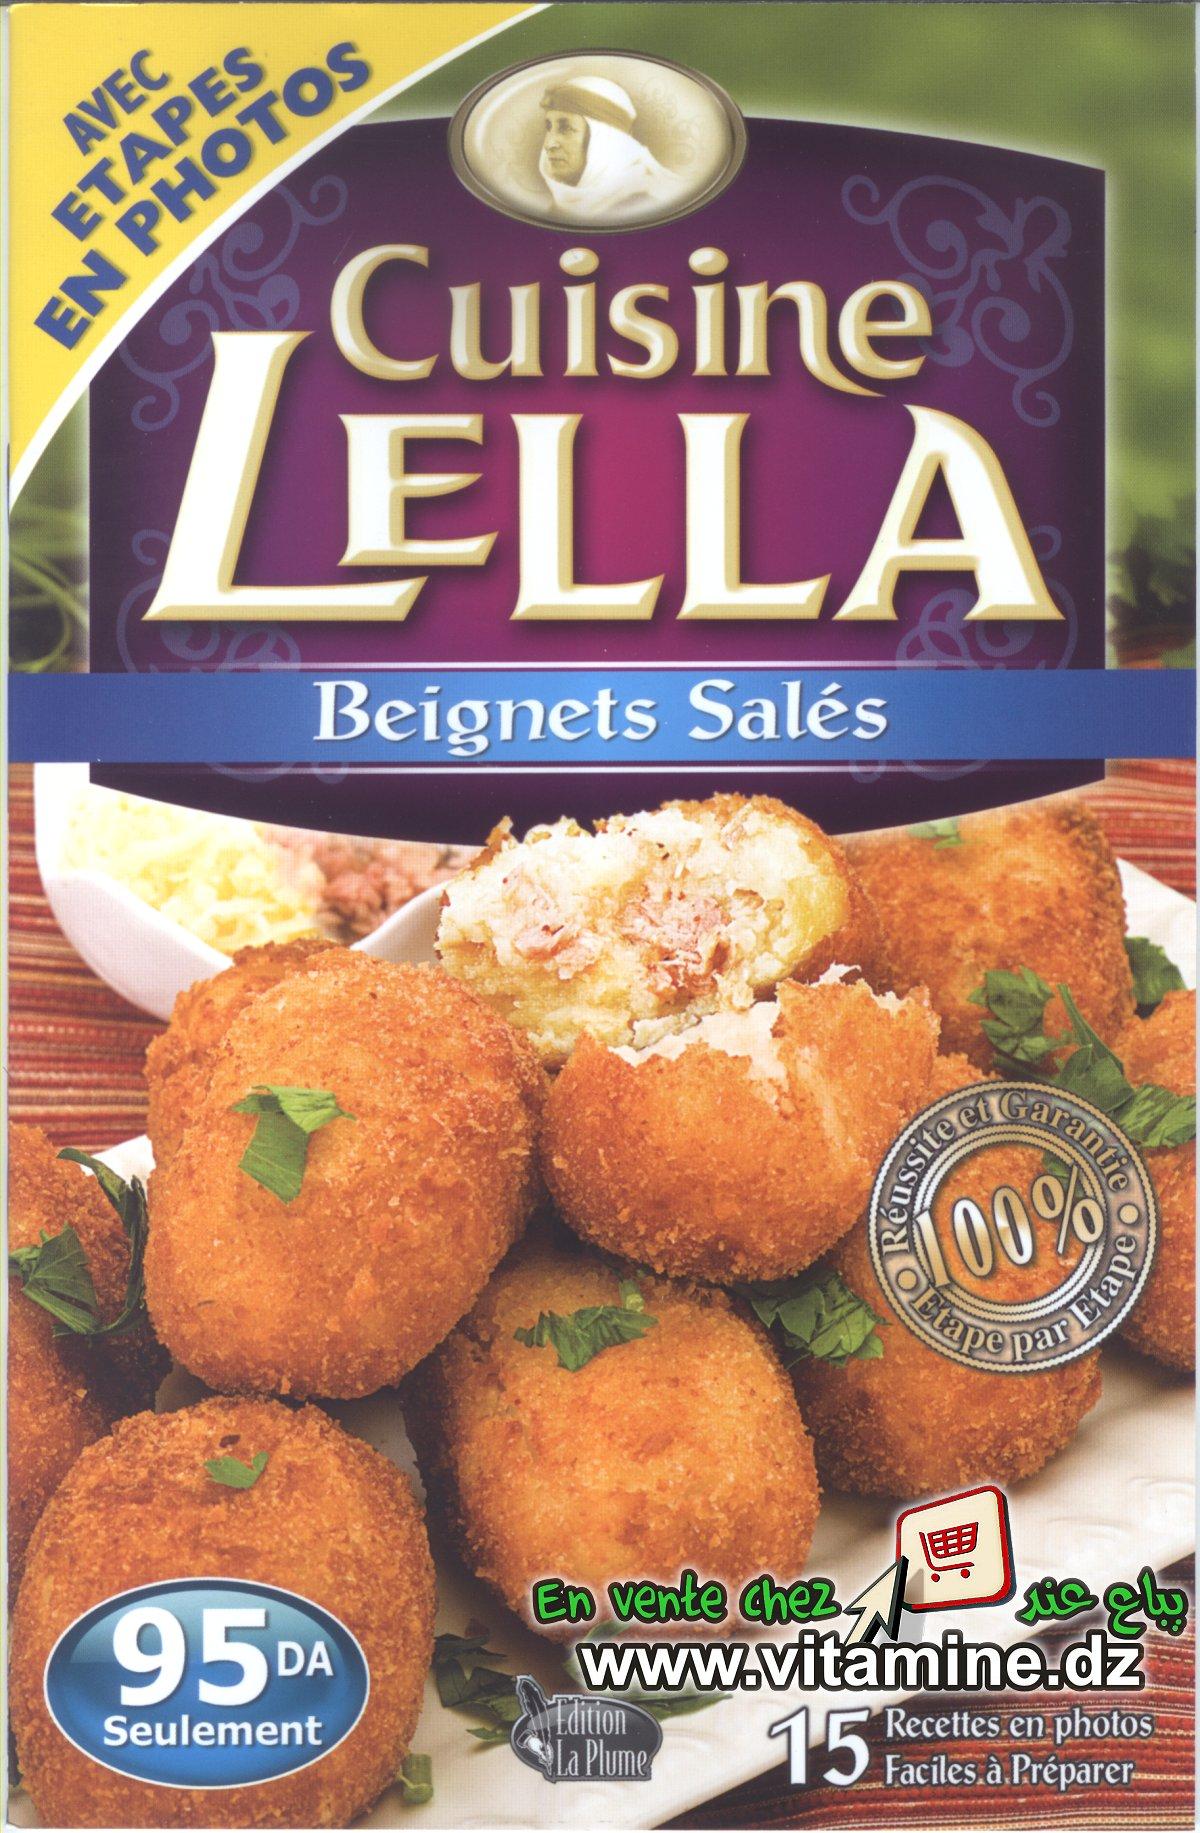 Cuisine Lella - Beignets salés